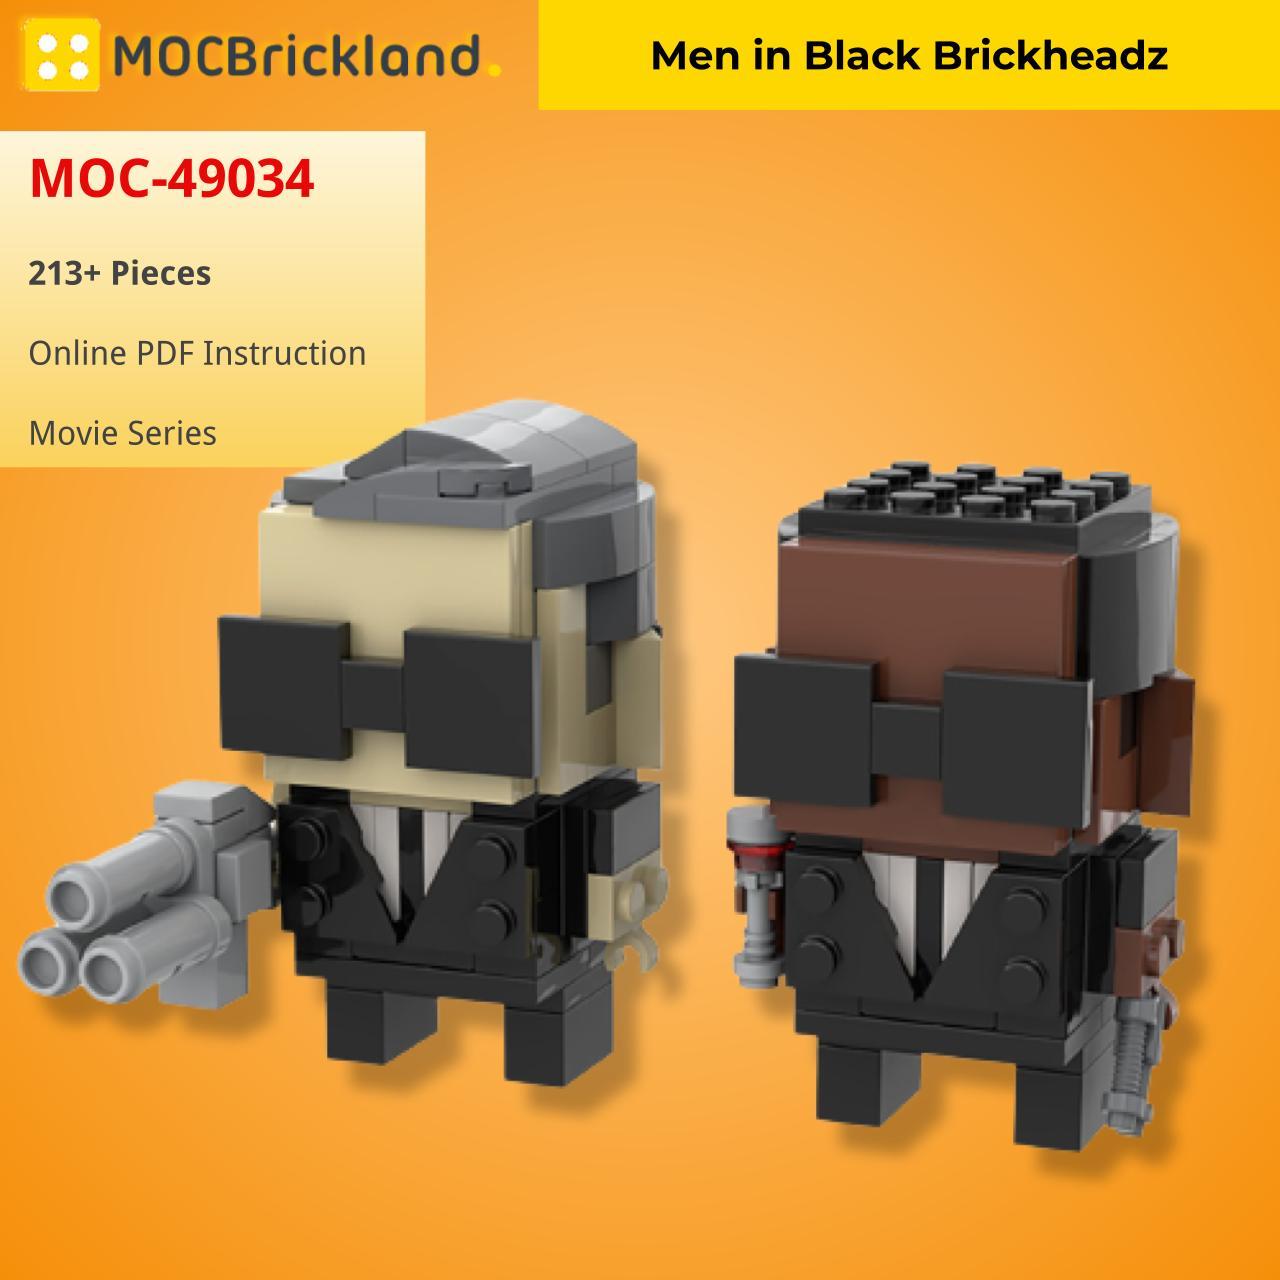 Men in Black Brickheadz MOVIE MOC-49034 WITH 213 PIECES